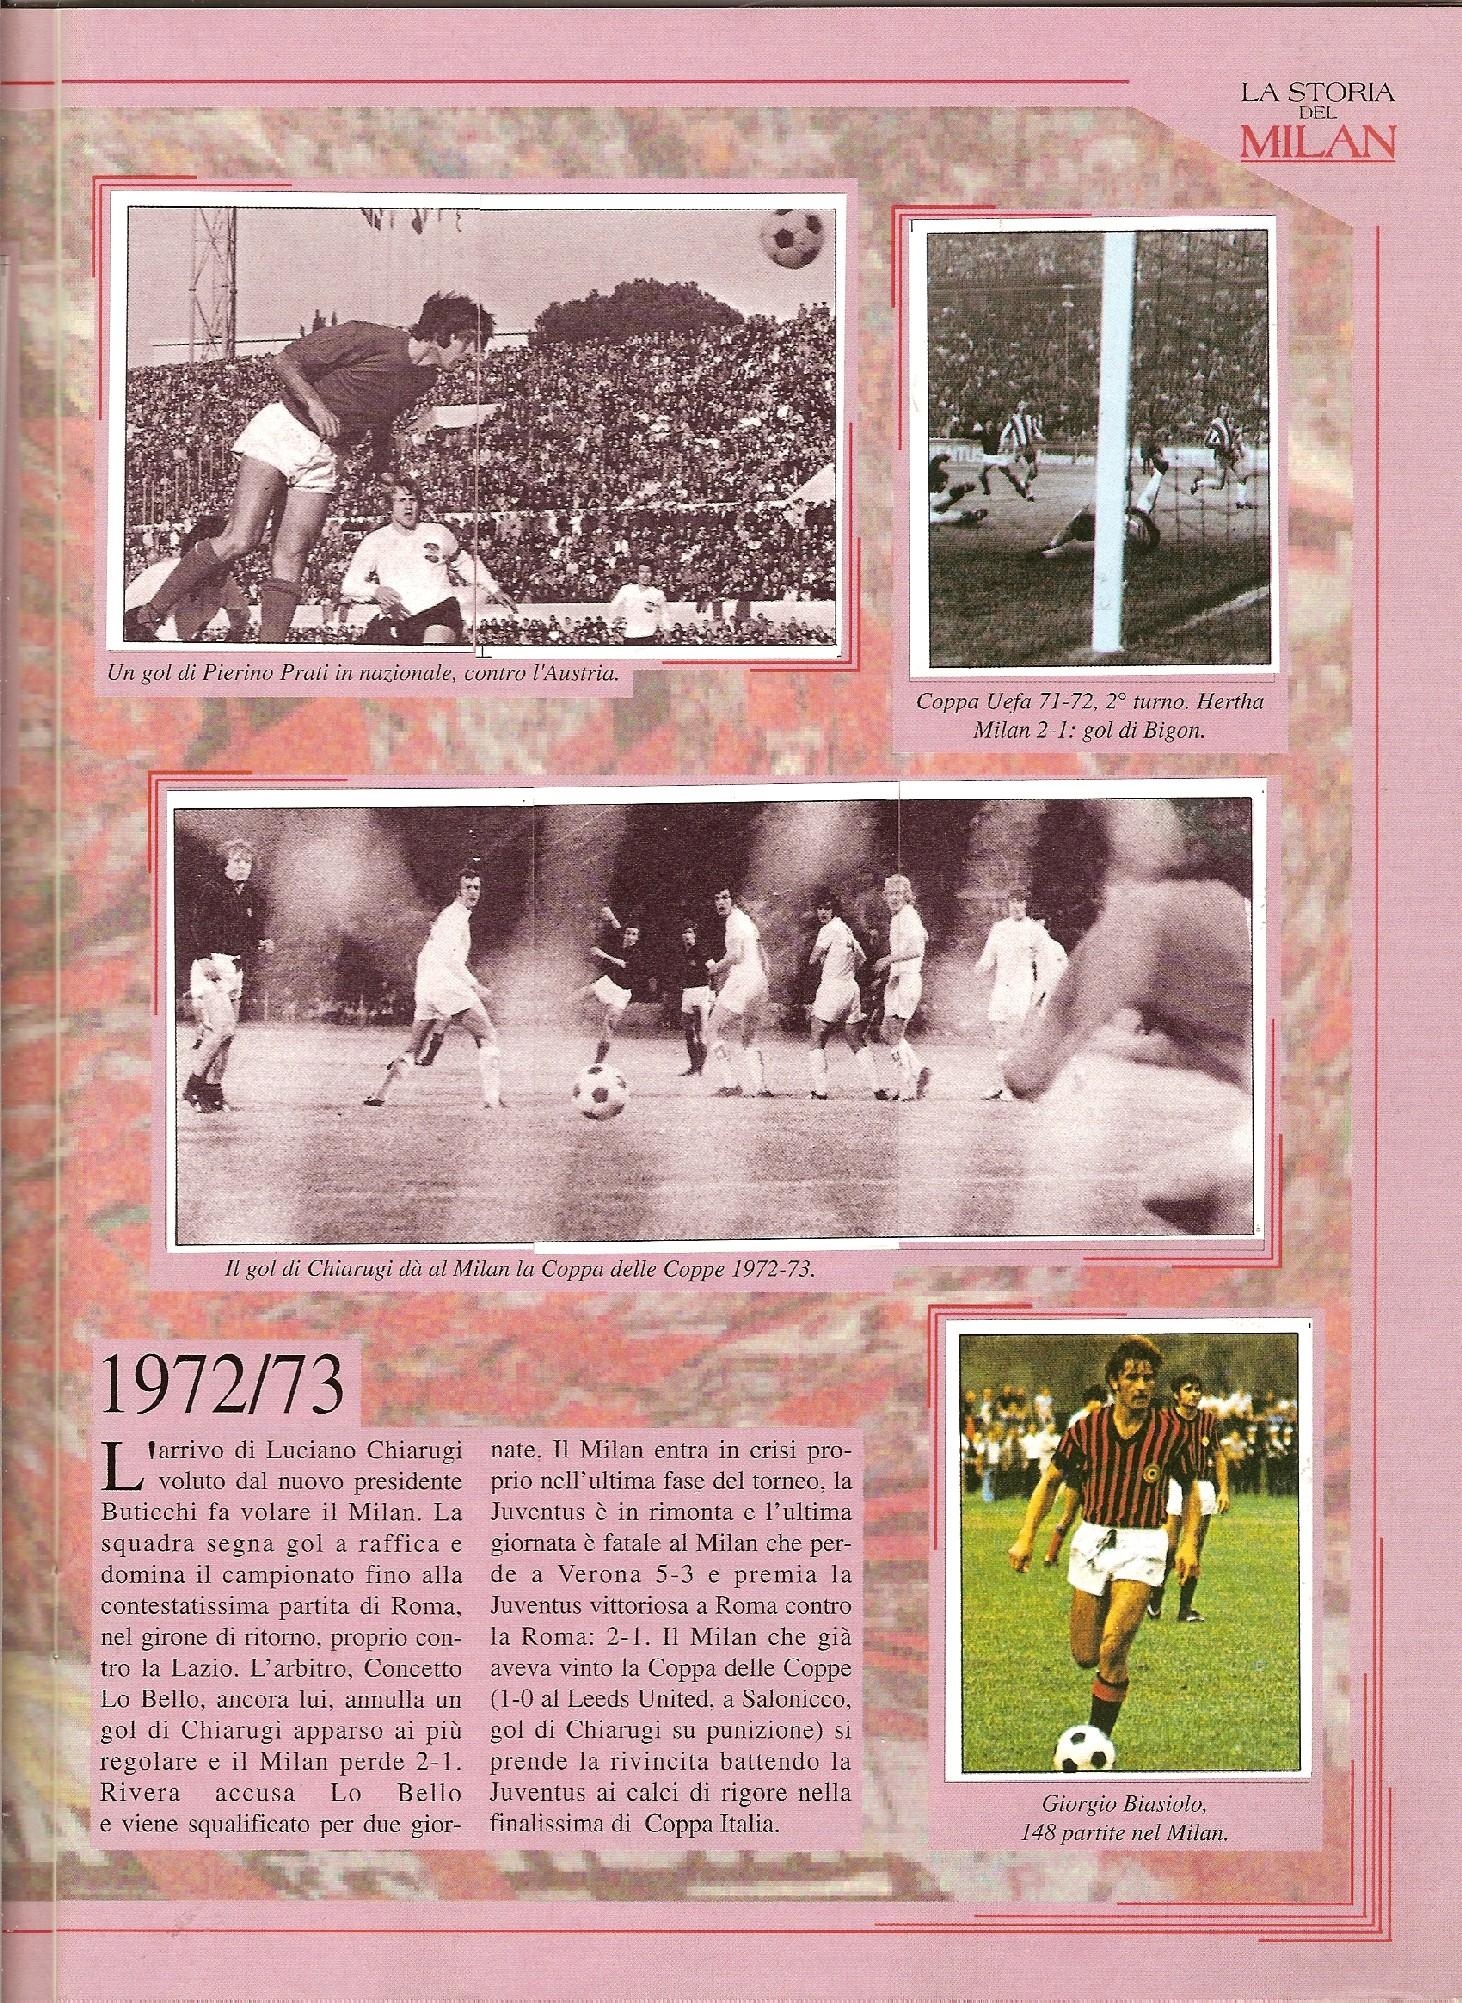 La storia del Milan - Masters 1992